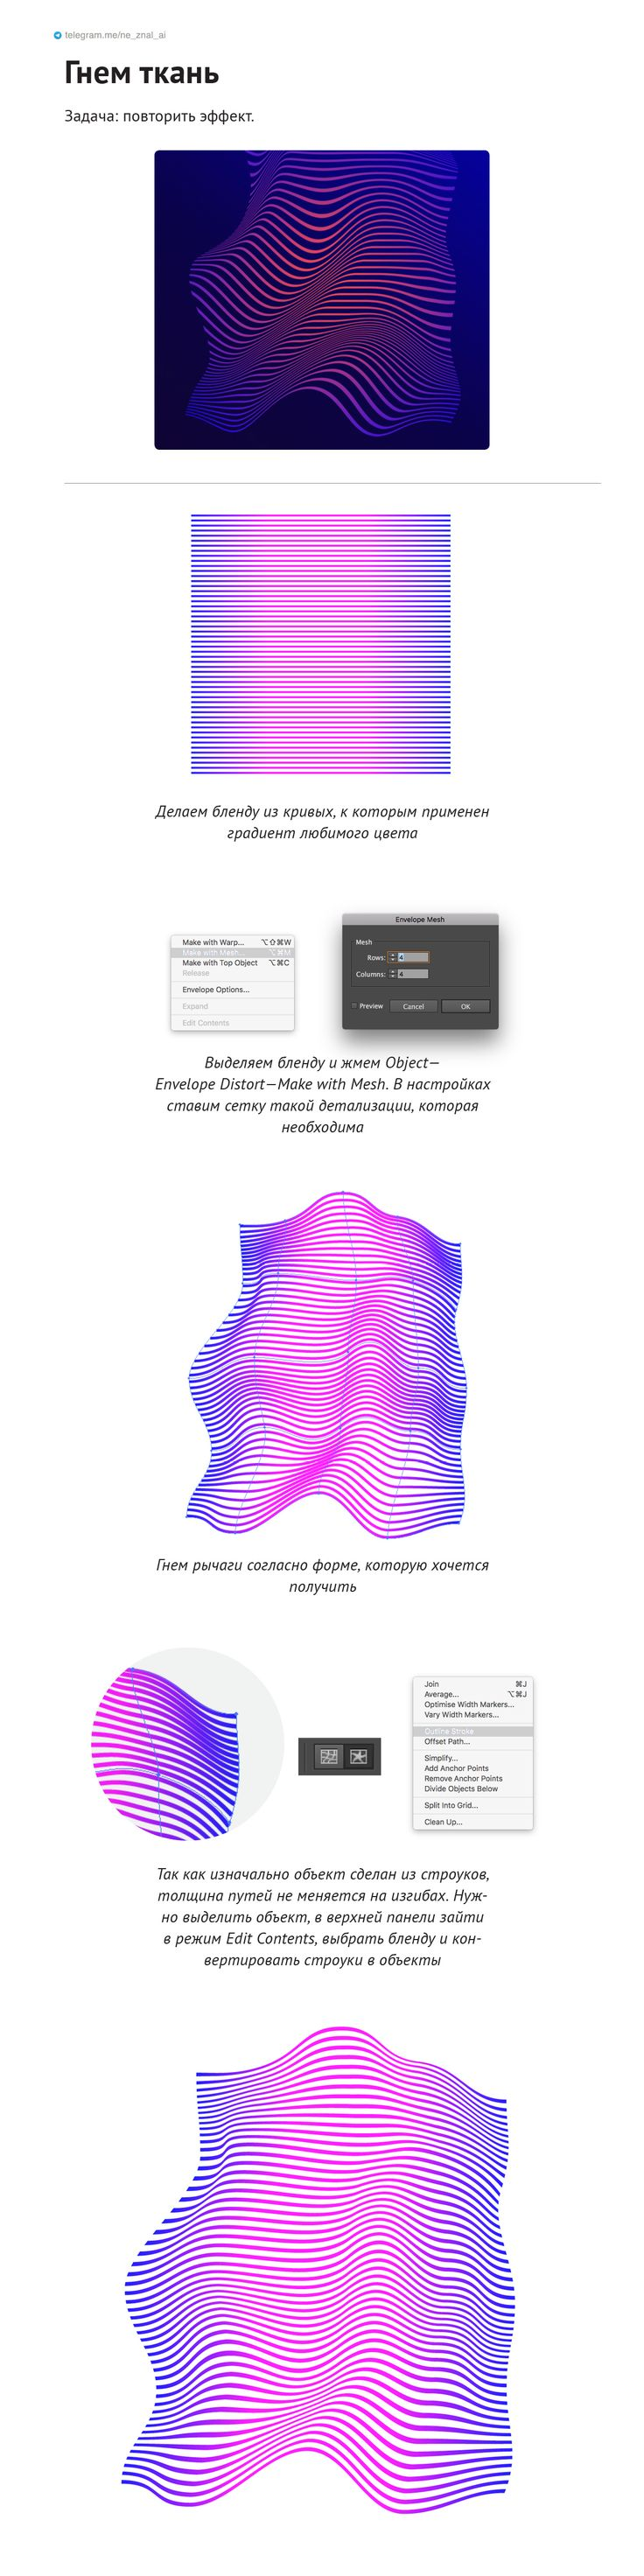 Гнем ткань  | AI Tips Cards